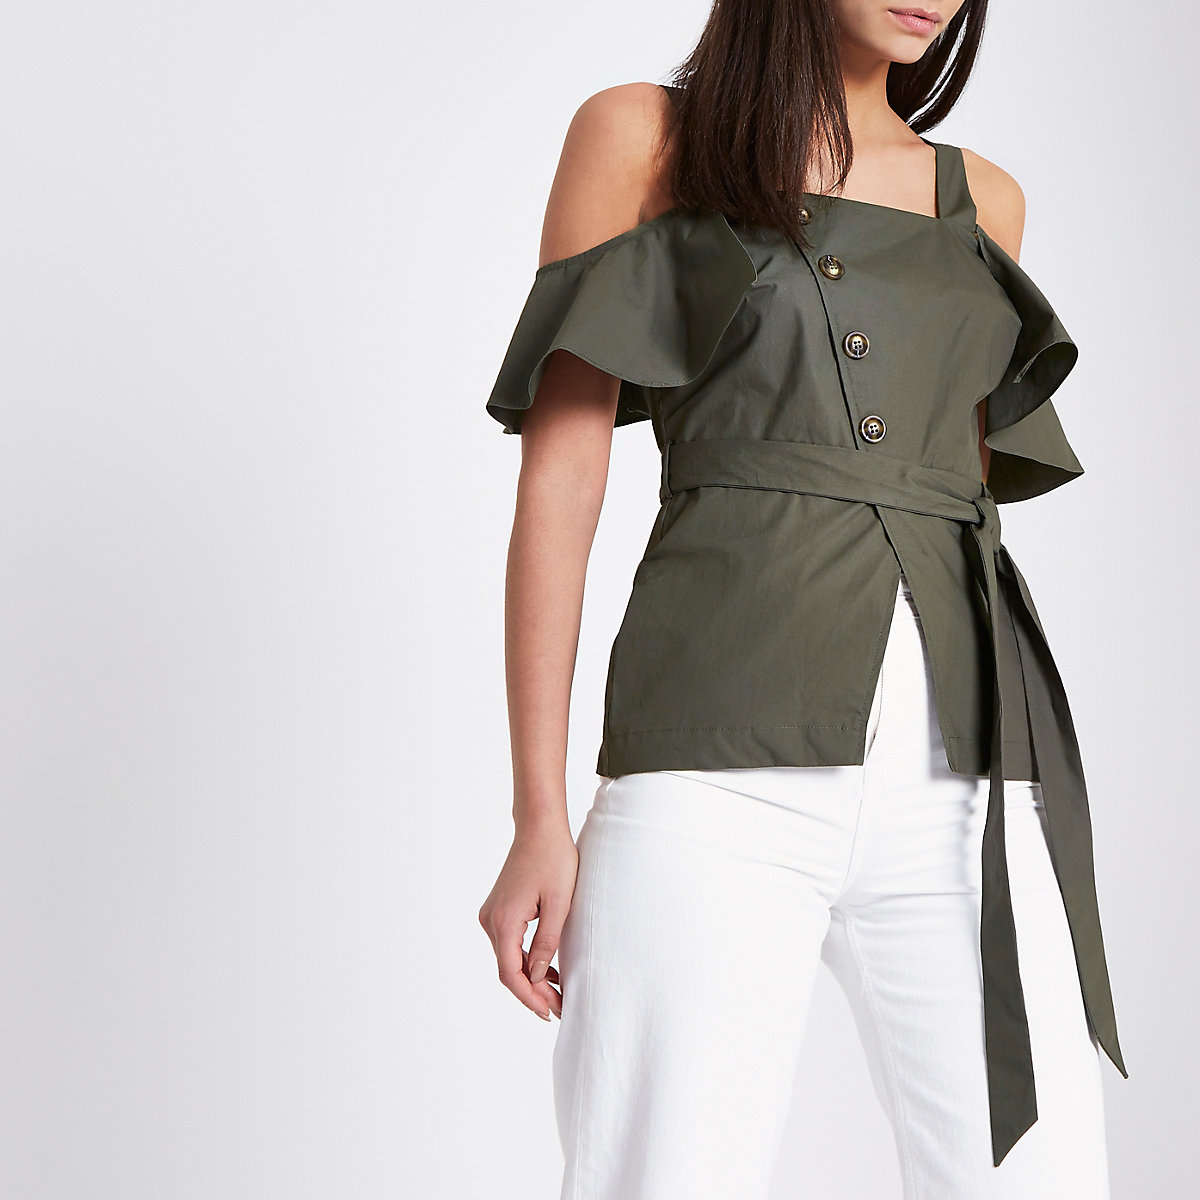 Khaki green asymmetric button tie waist top